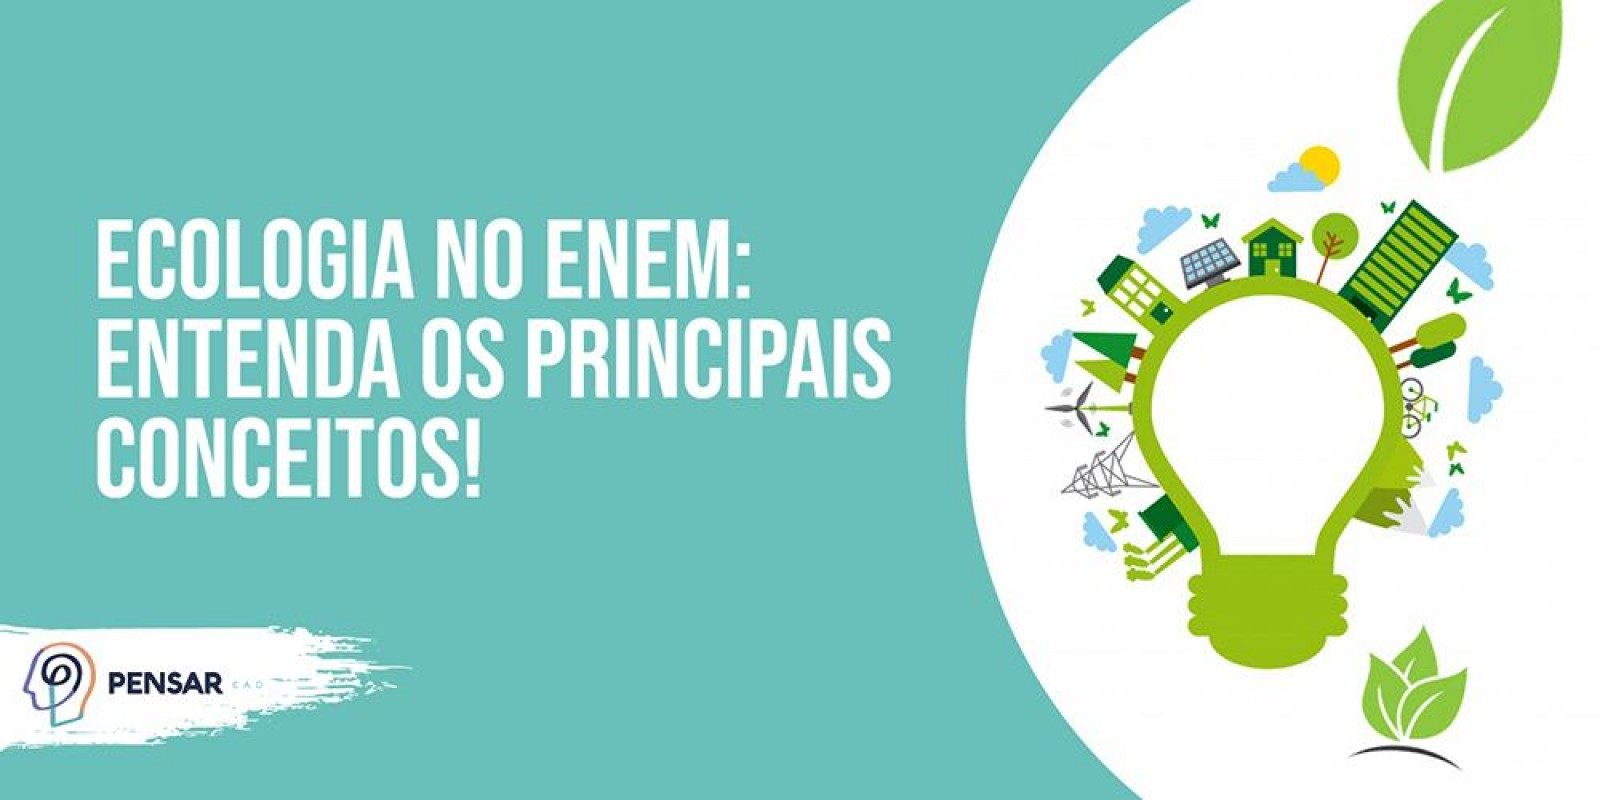 Ecologia no ENEM: entenda os principais conceitos!